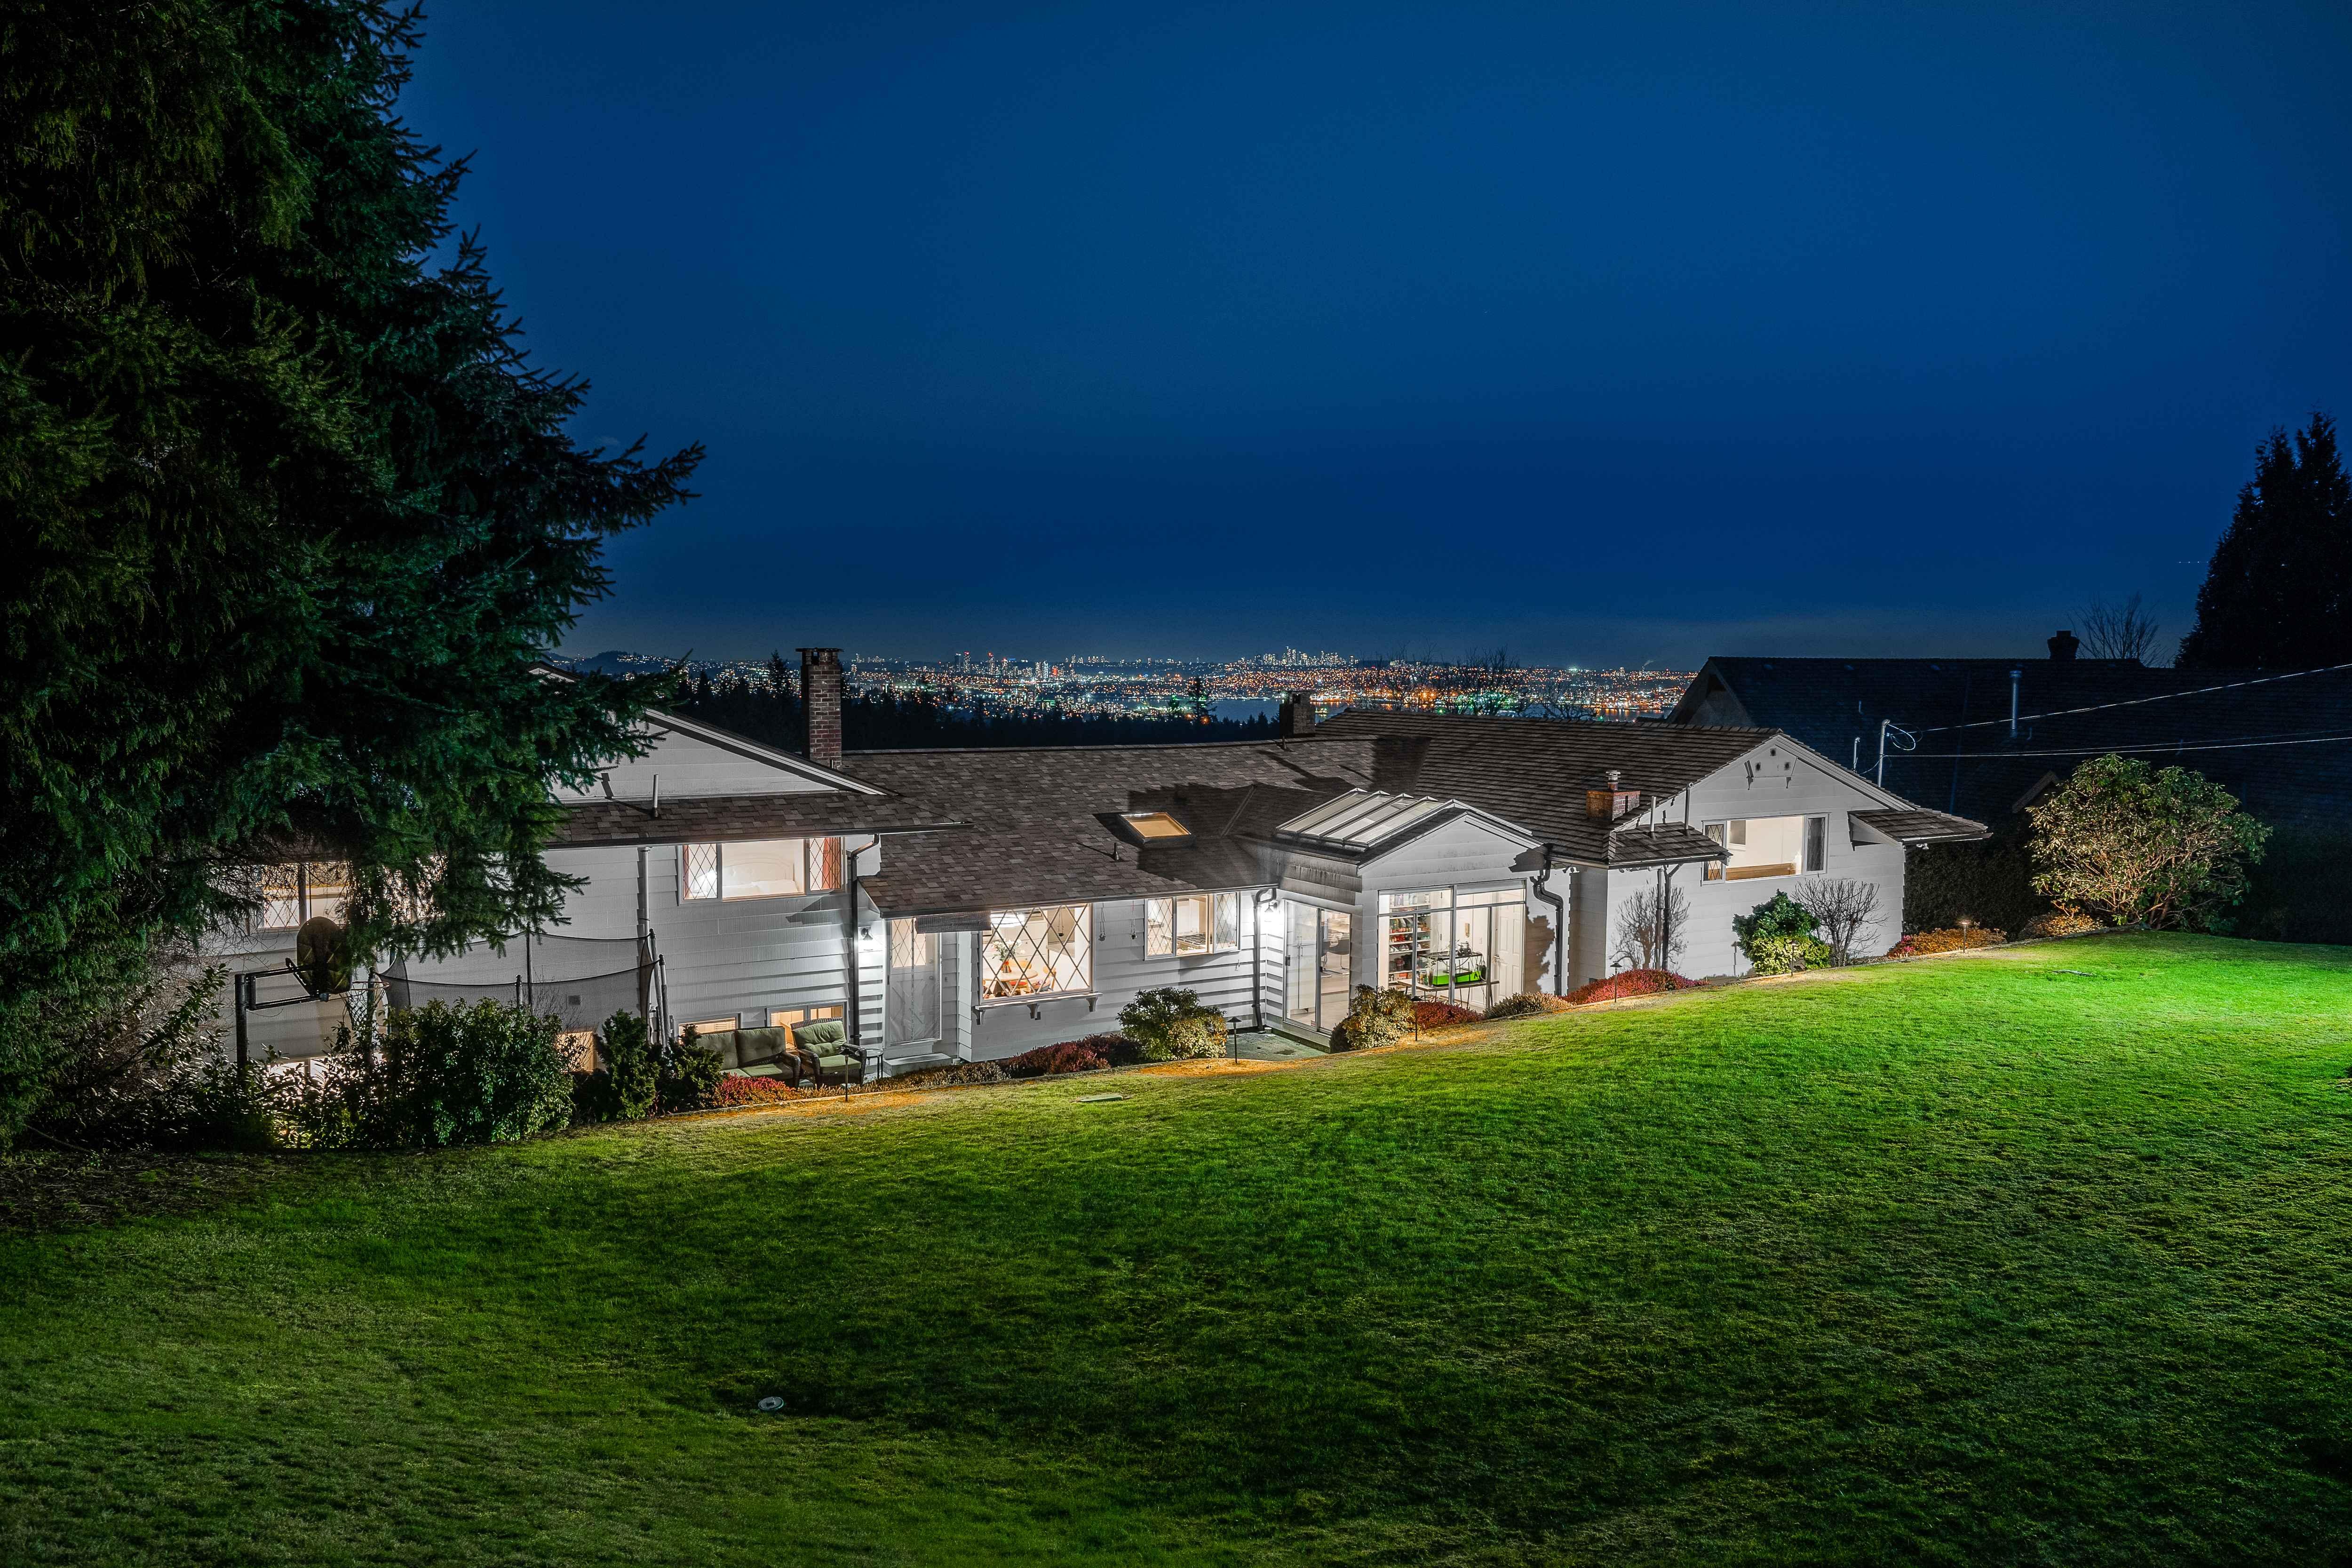 685 King Georges Way, British Properties, West Vancouver 2